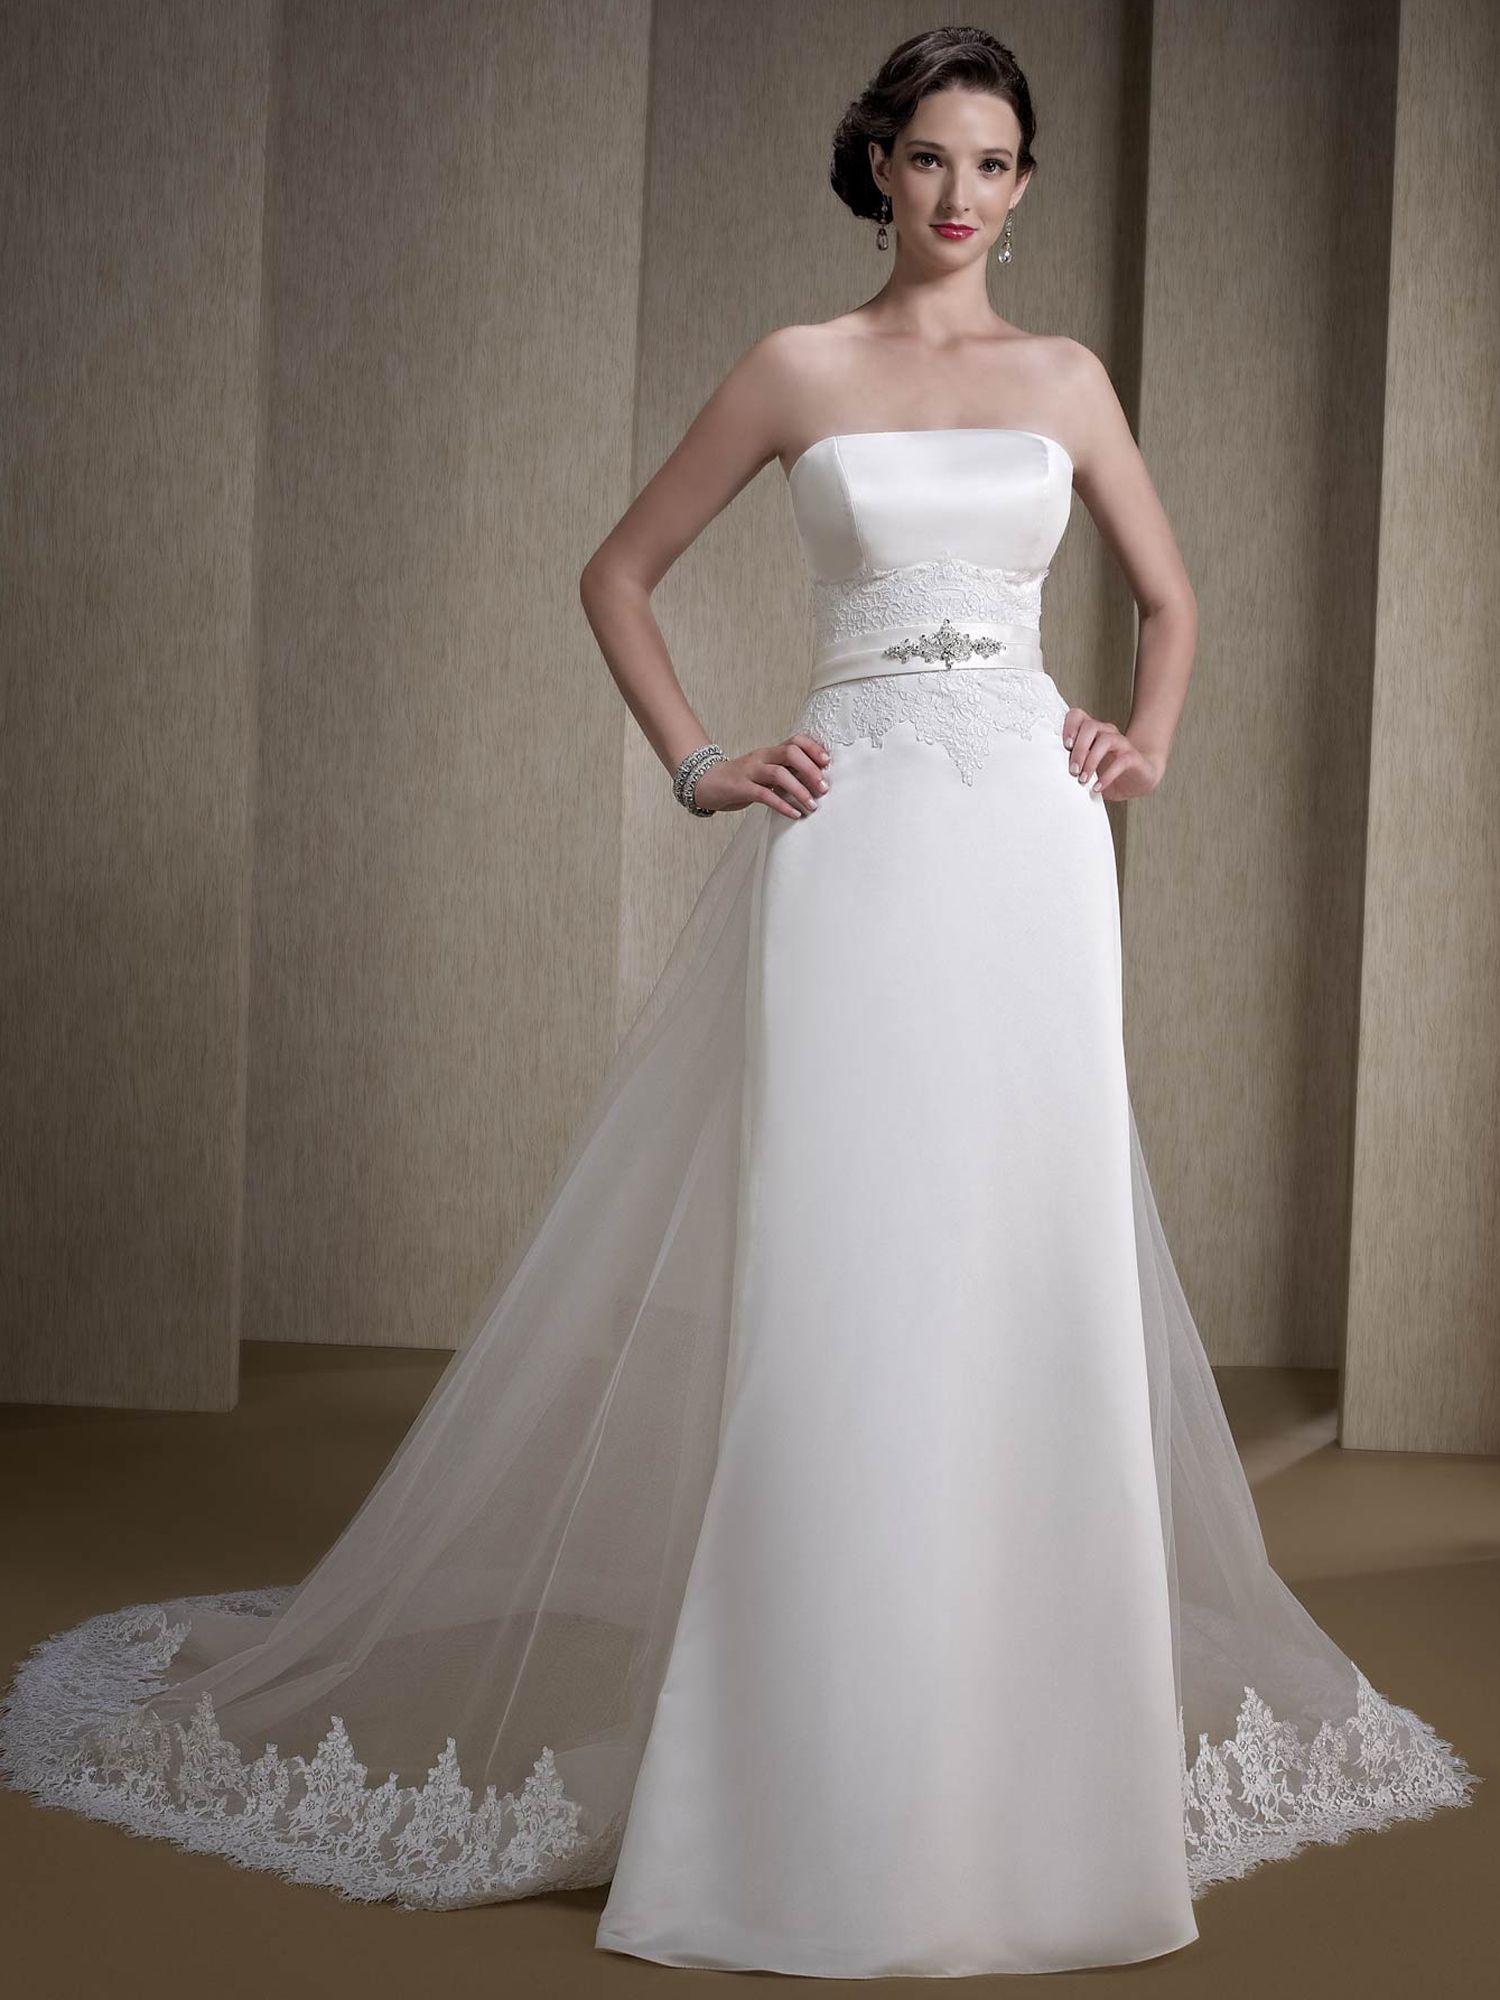 interesting wedding gown Detachable train wedding dress